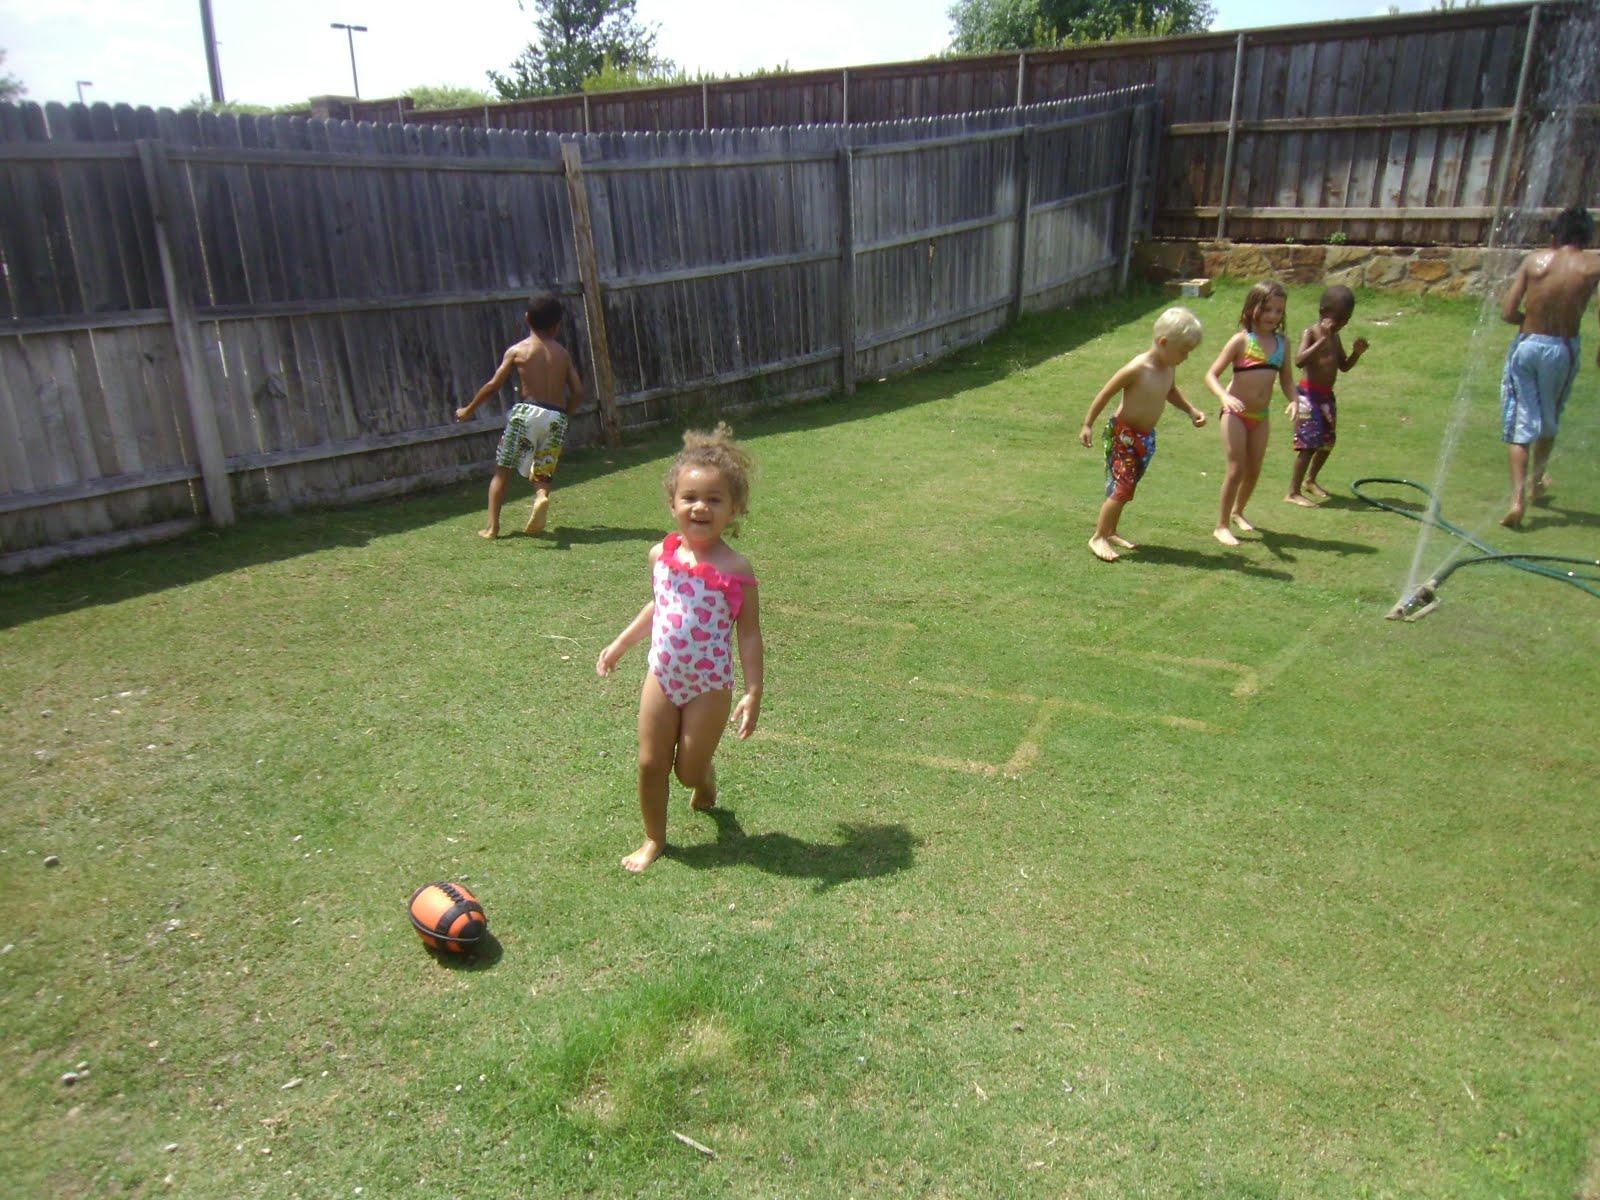 The Big Texas Hill Family: Daycare kids backyard slip n